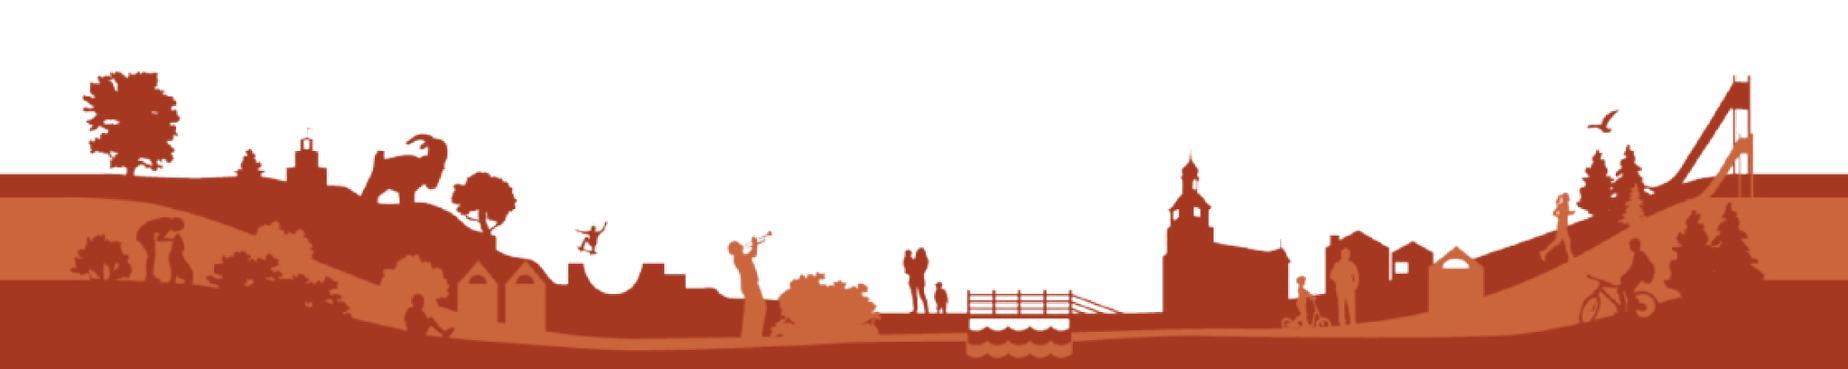 koppasrmasen background-min